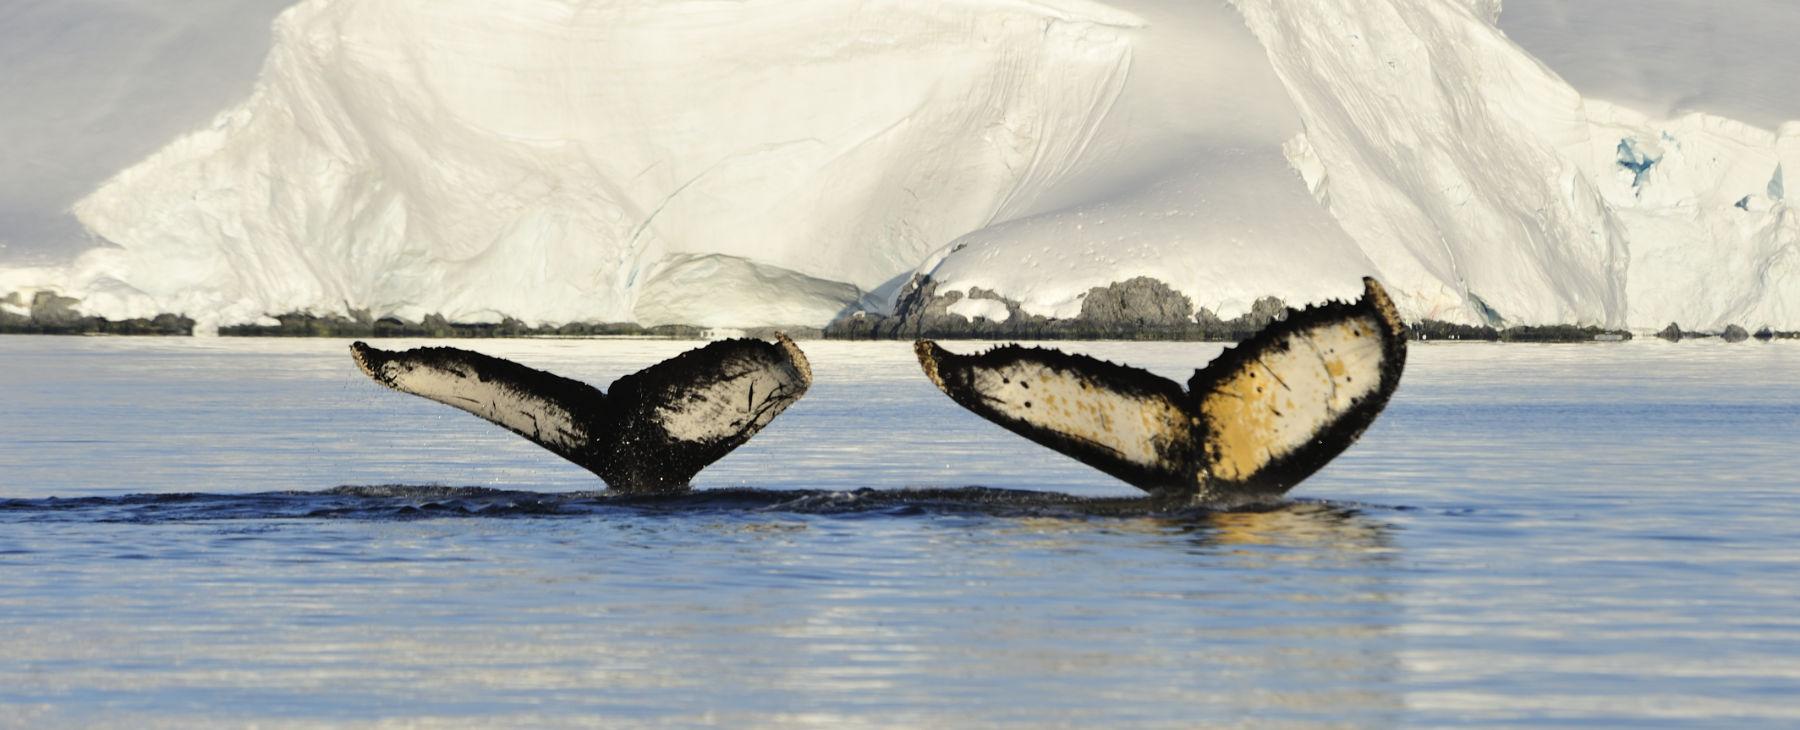 Luxusreise Antarktis